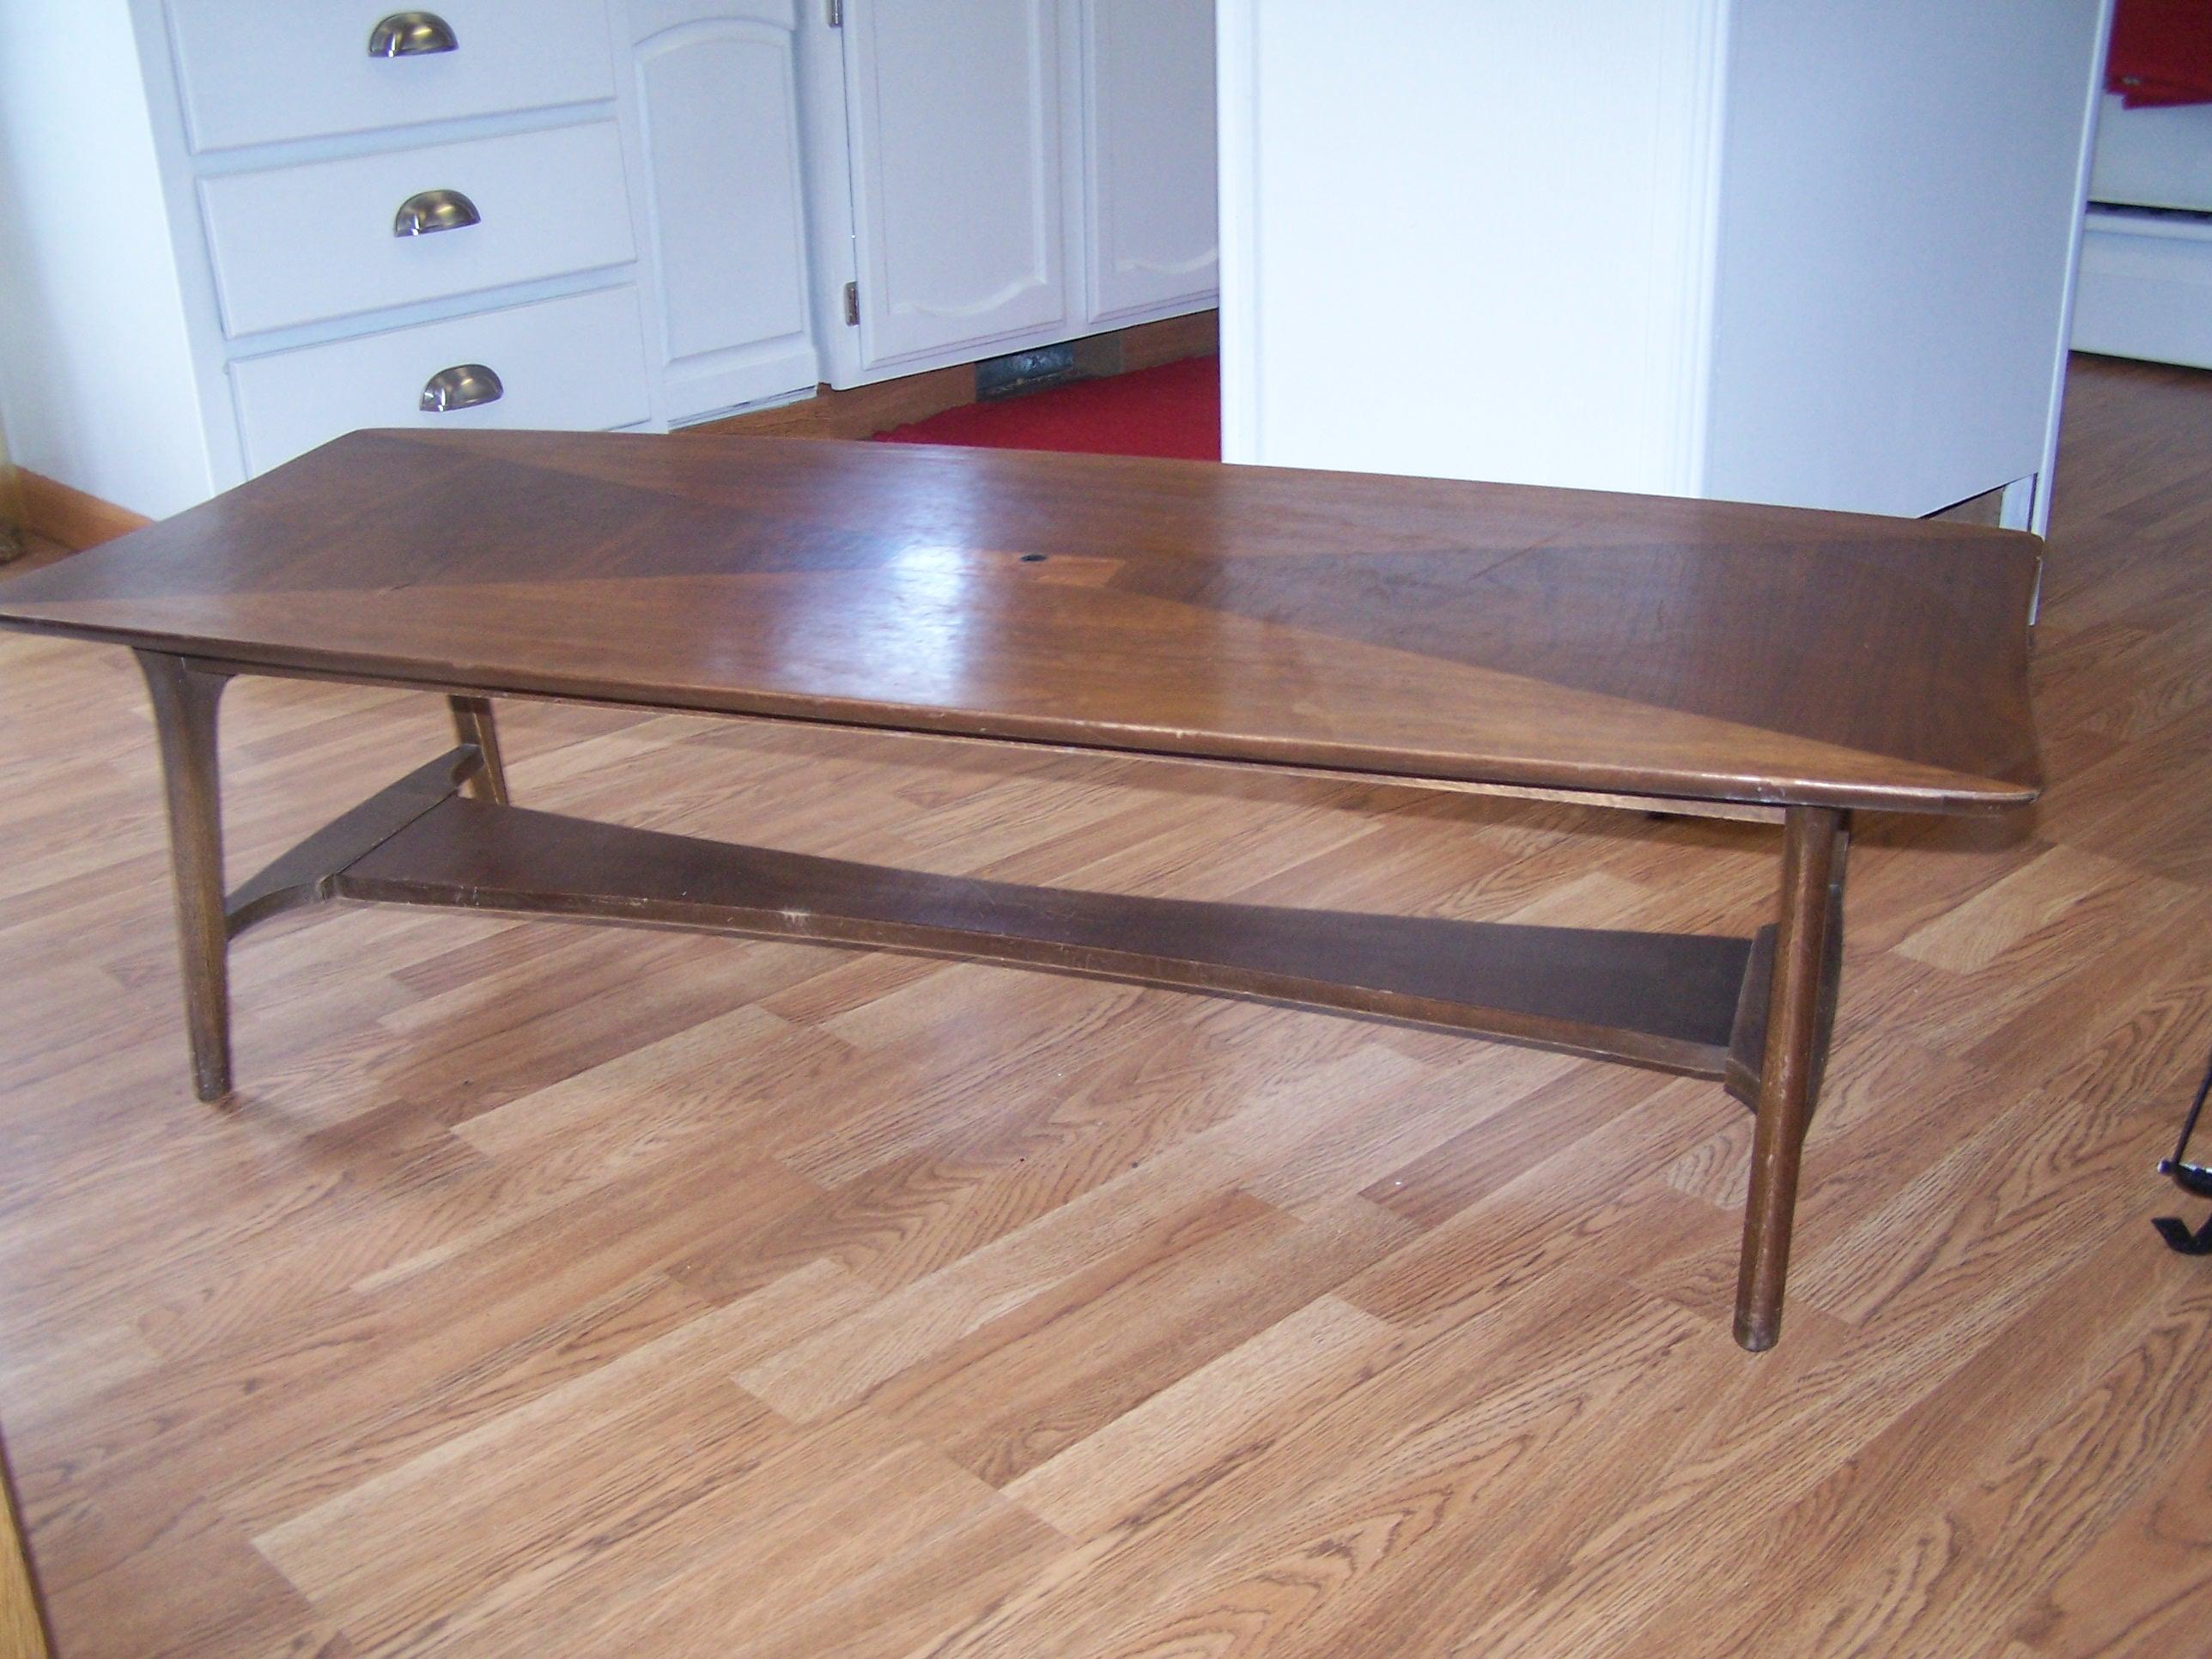 good-coff-table-001